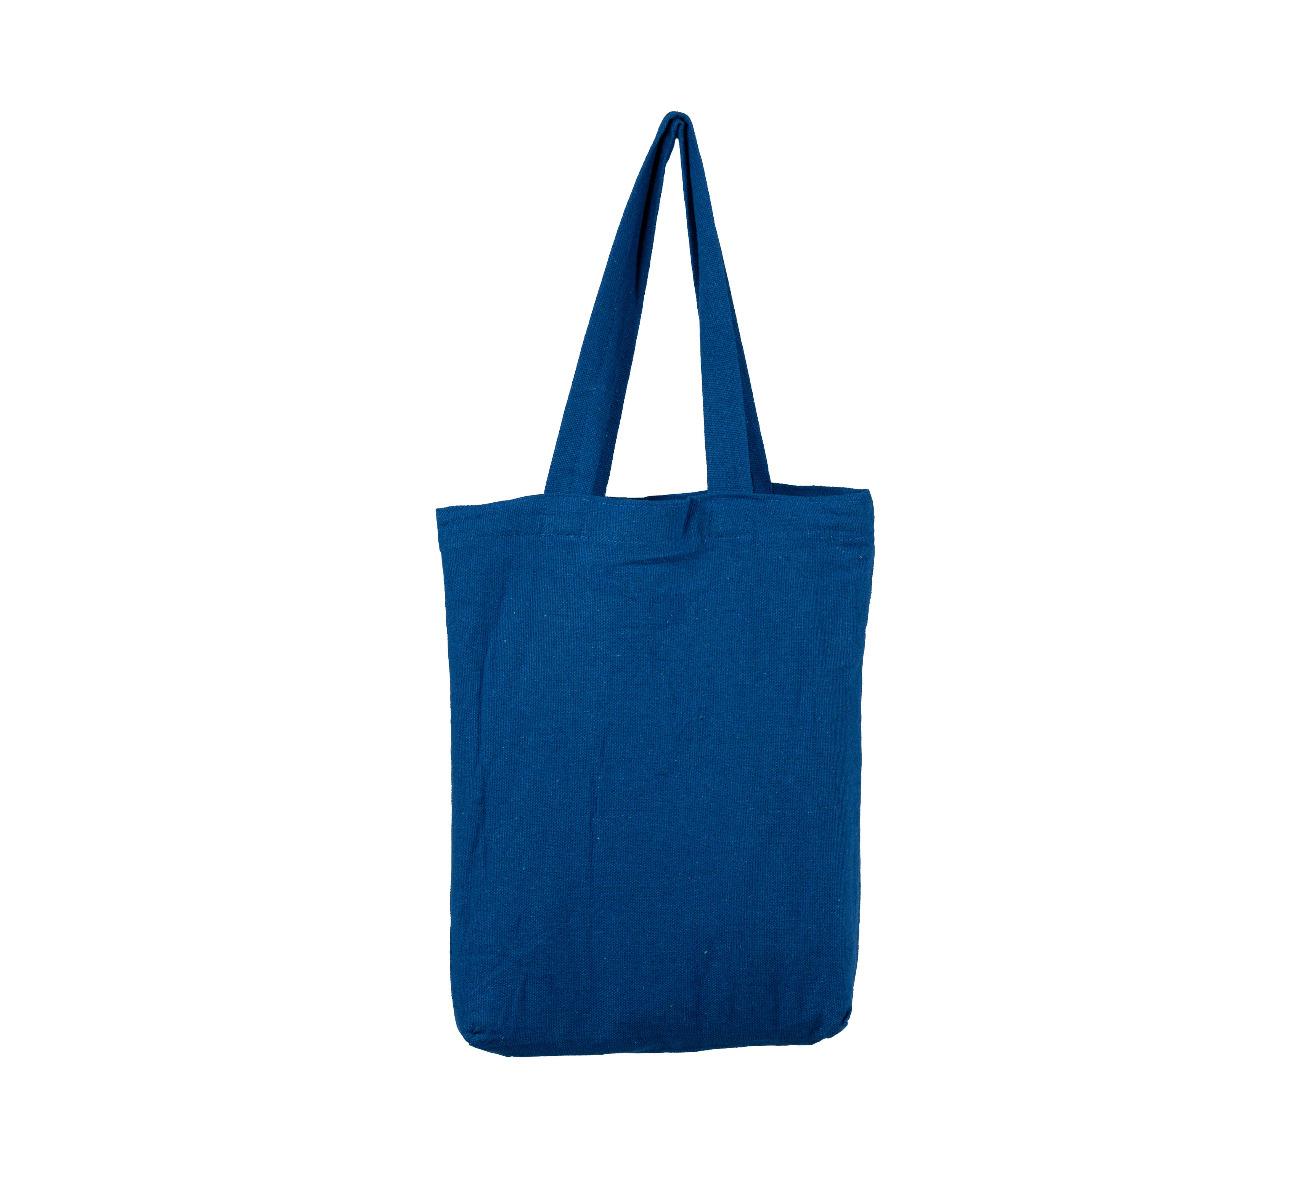 Hangmat 'Organic' Blue - Tropilex �